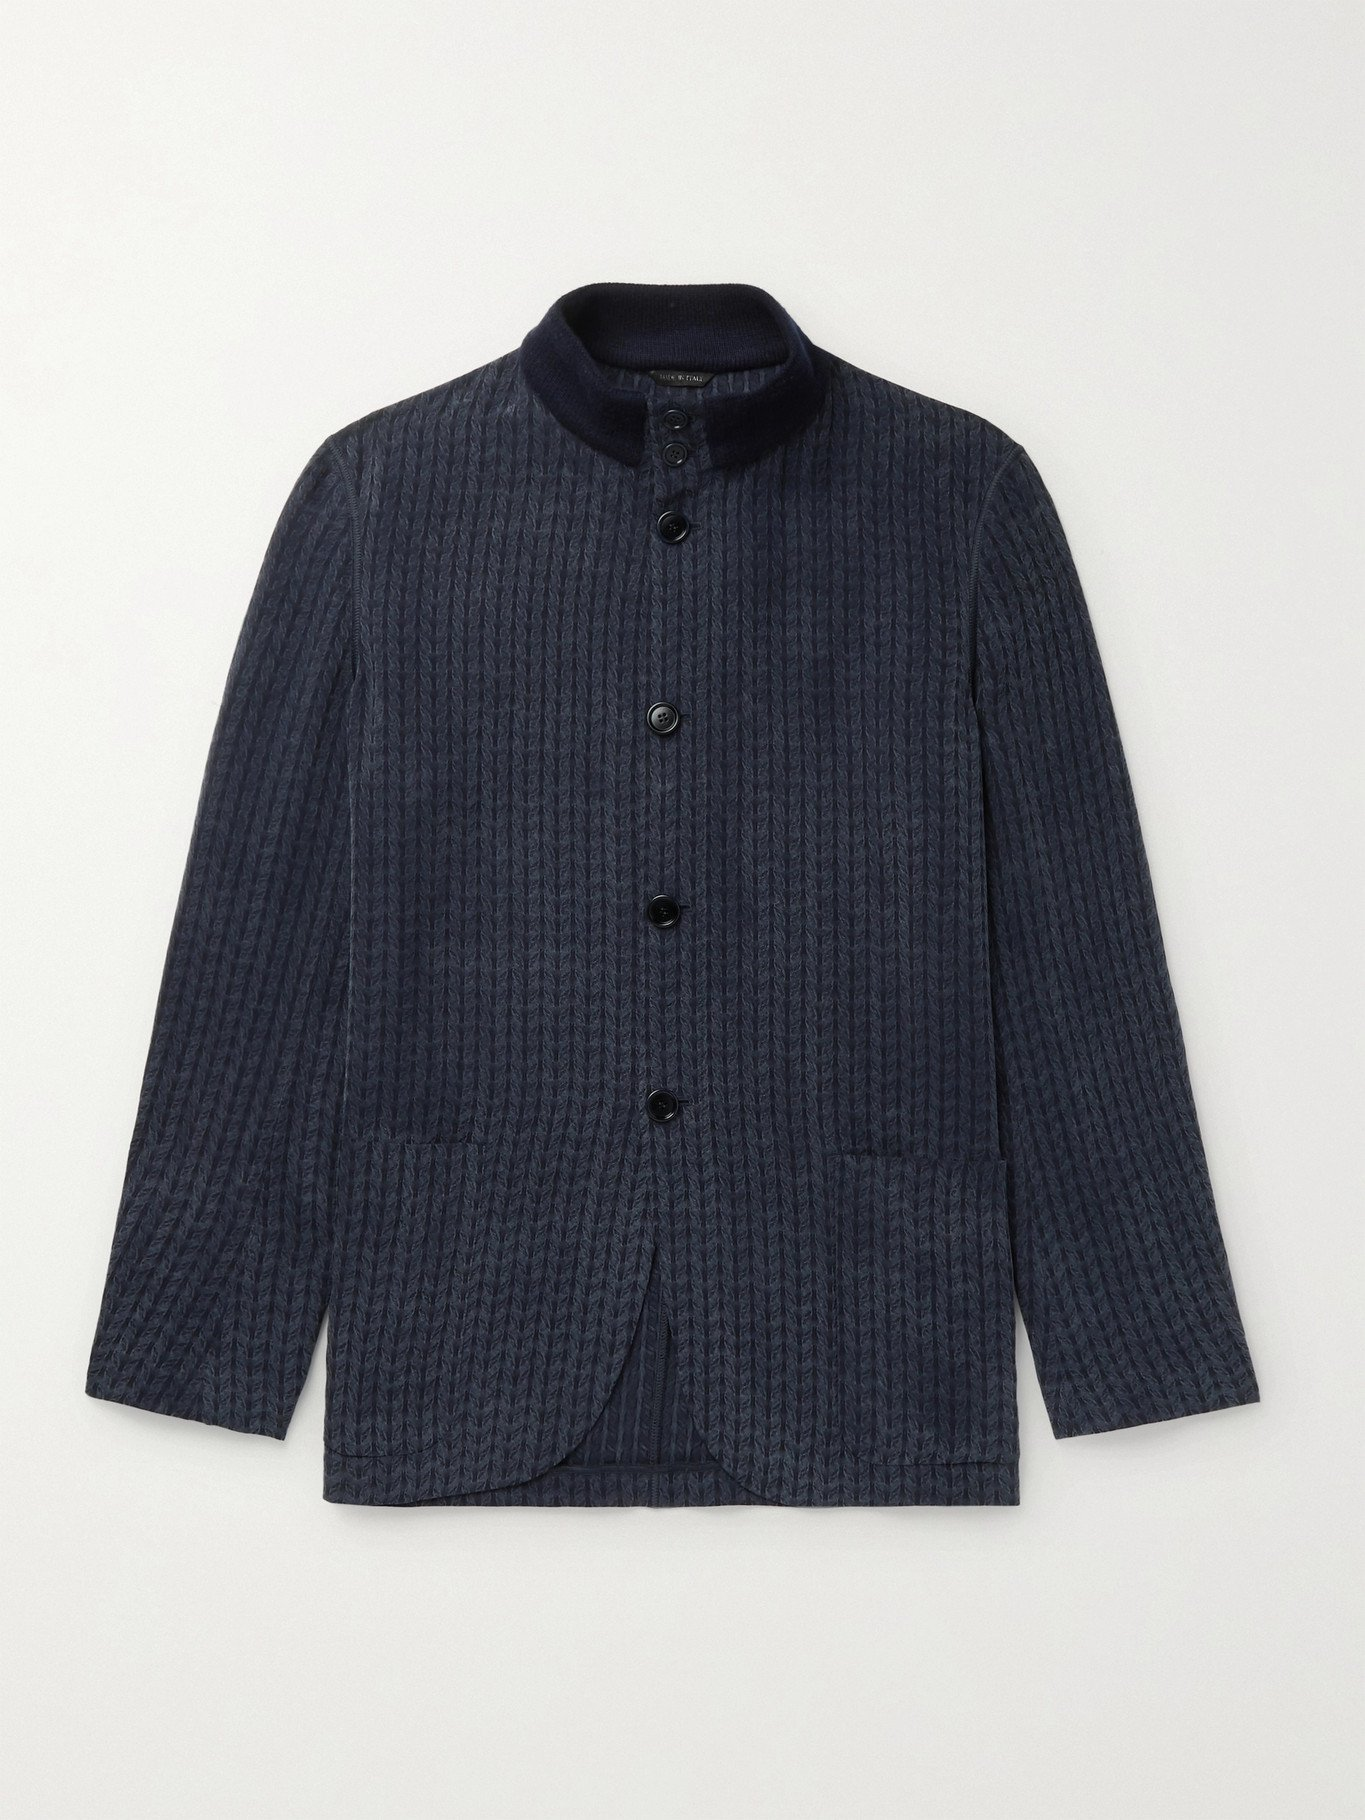 GIORGIO ARMANI - Jacquard Shirt Jacket - Blue - IT 46